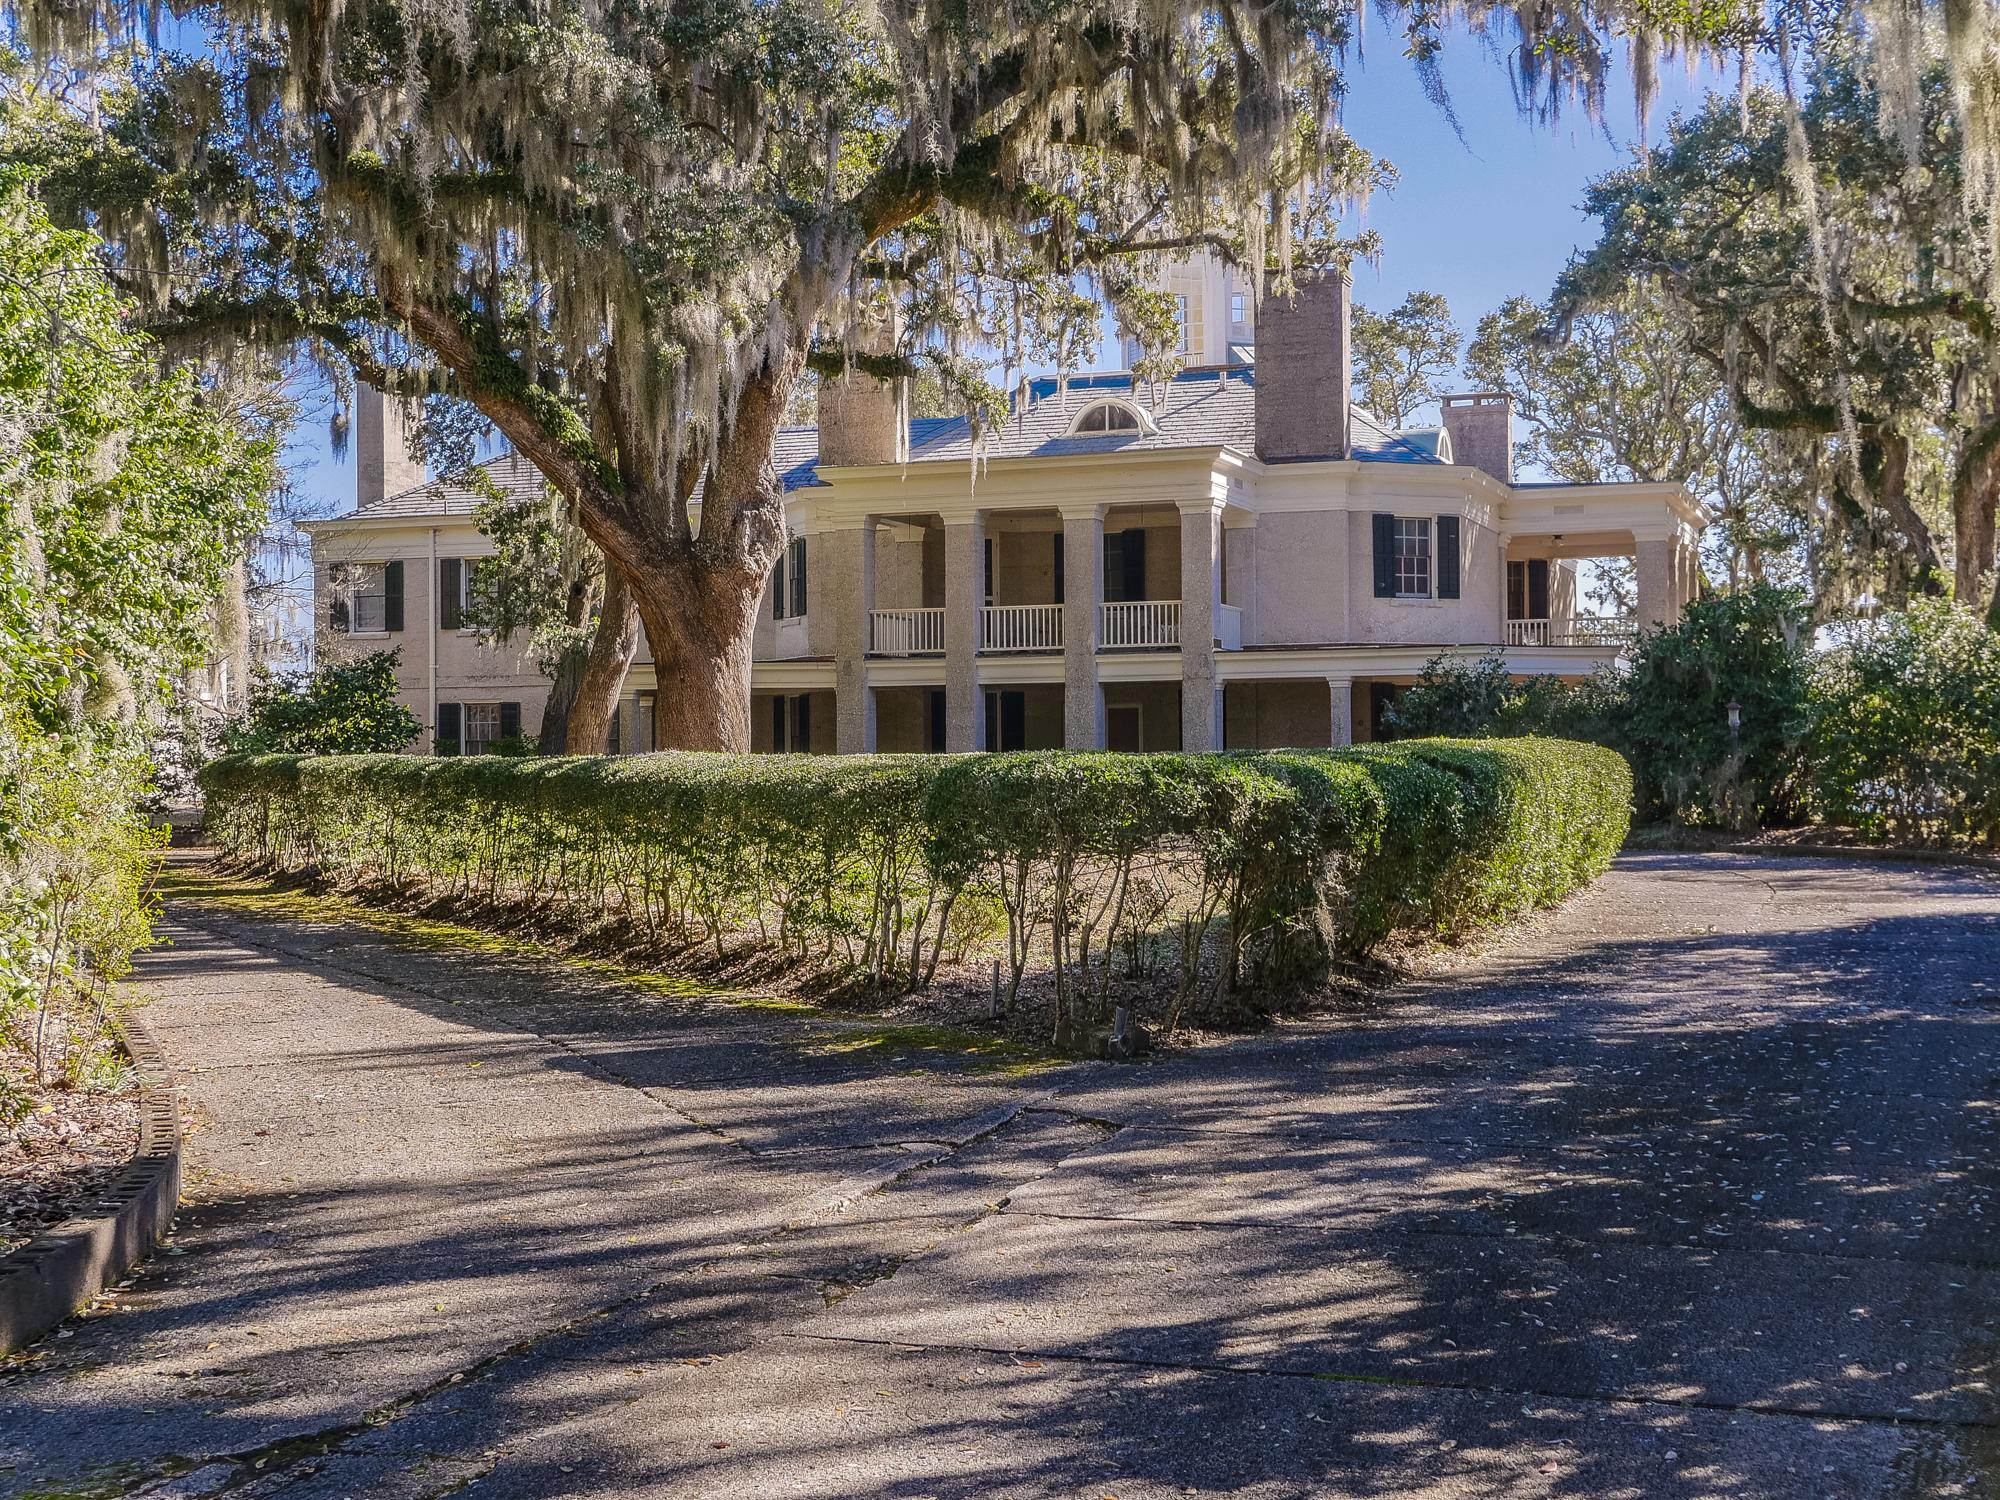 Single Family Home for Sale at 1913 Italian Renaissance Home Designed by Henry Bacon 7521 Masonboro Sound Road Wilmington, North Carolina, 28409 United States